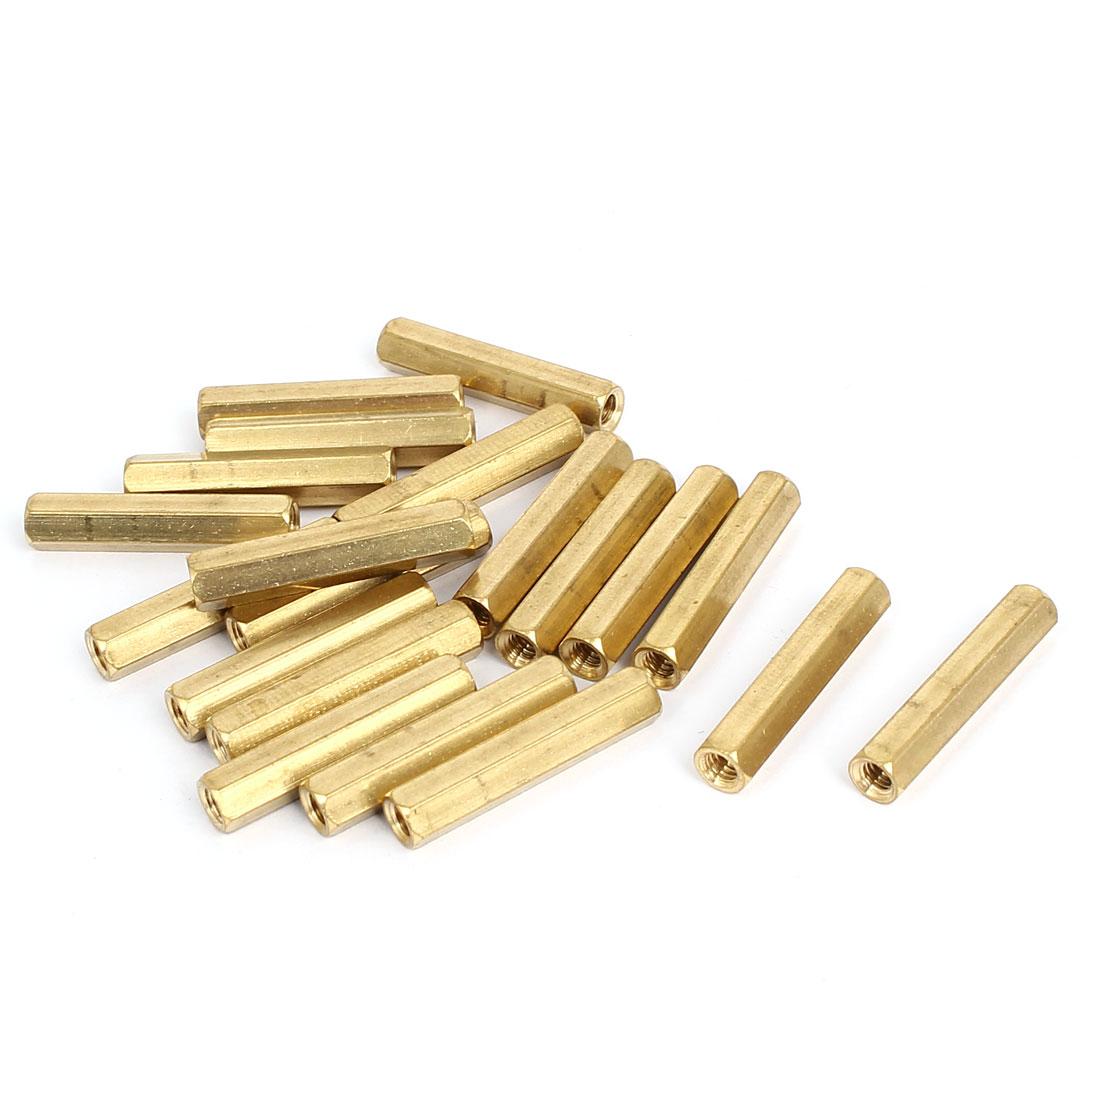 M4x30mm Brass Hex Hexagonal Female Thread PCB Standoff Spacer 20pcs